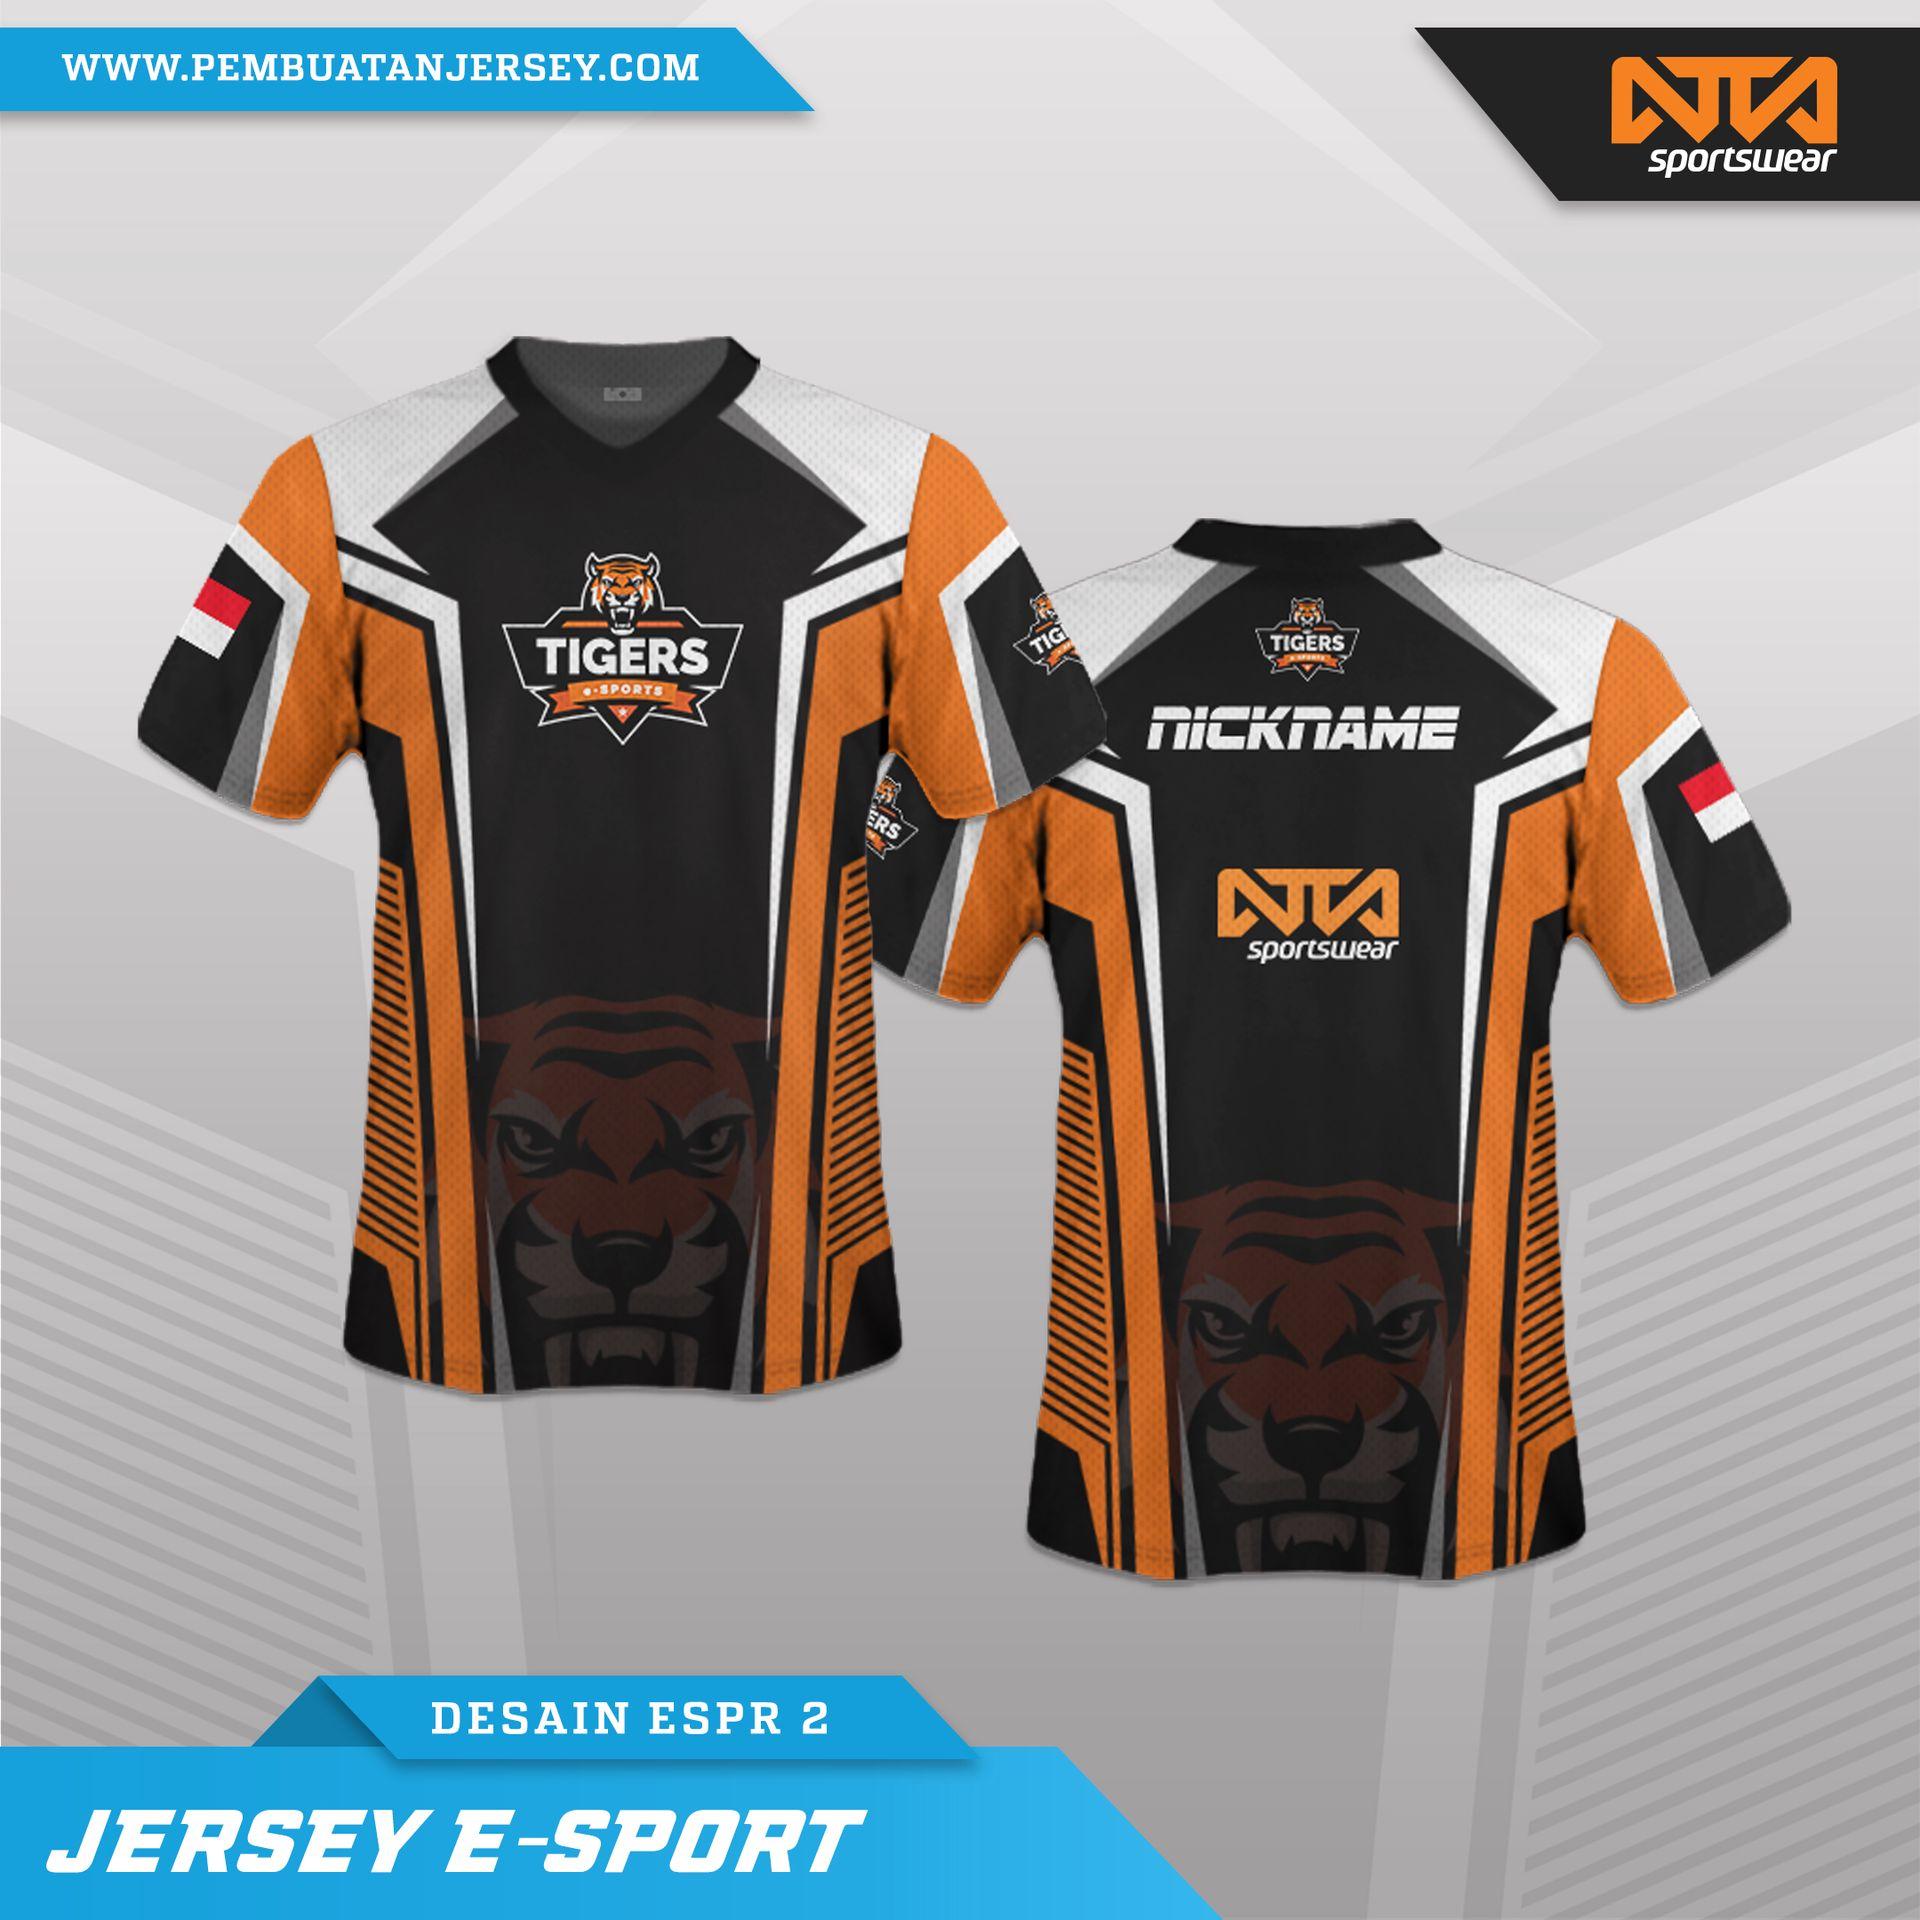 5400 Koleksi Desain Baju Esport Keren Terbaru